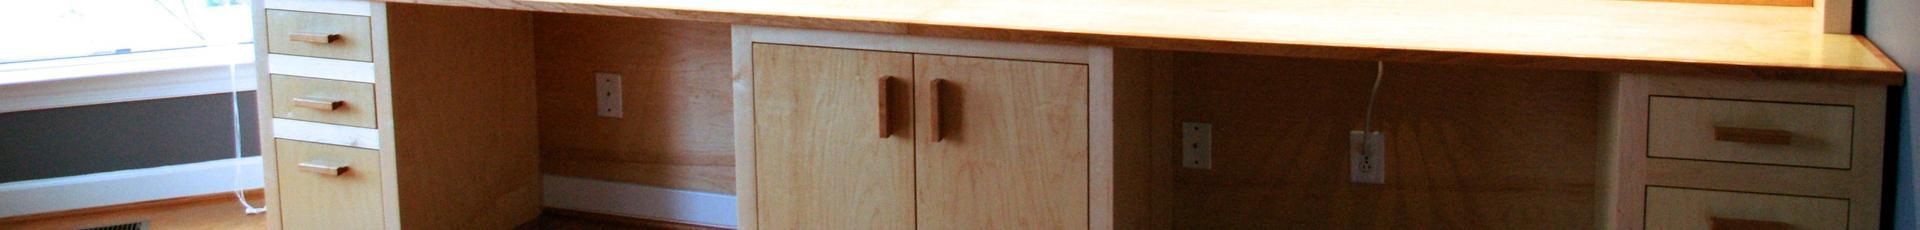 antet dulapuri birou